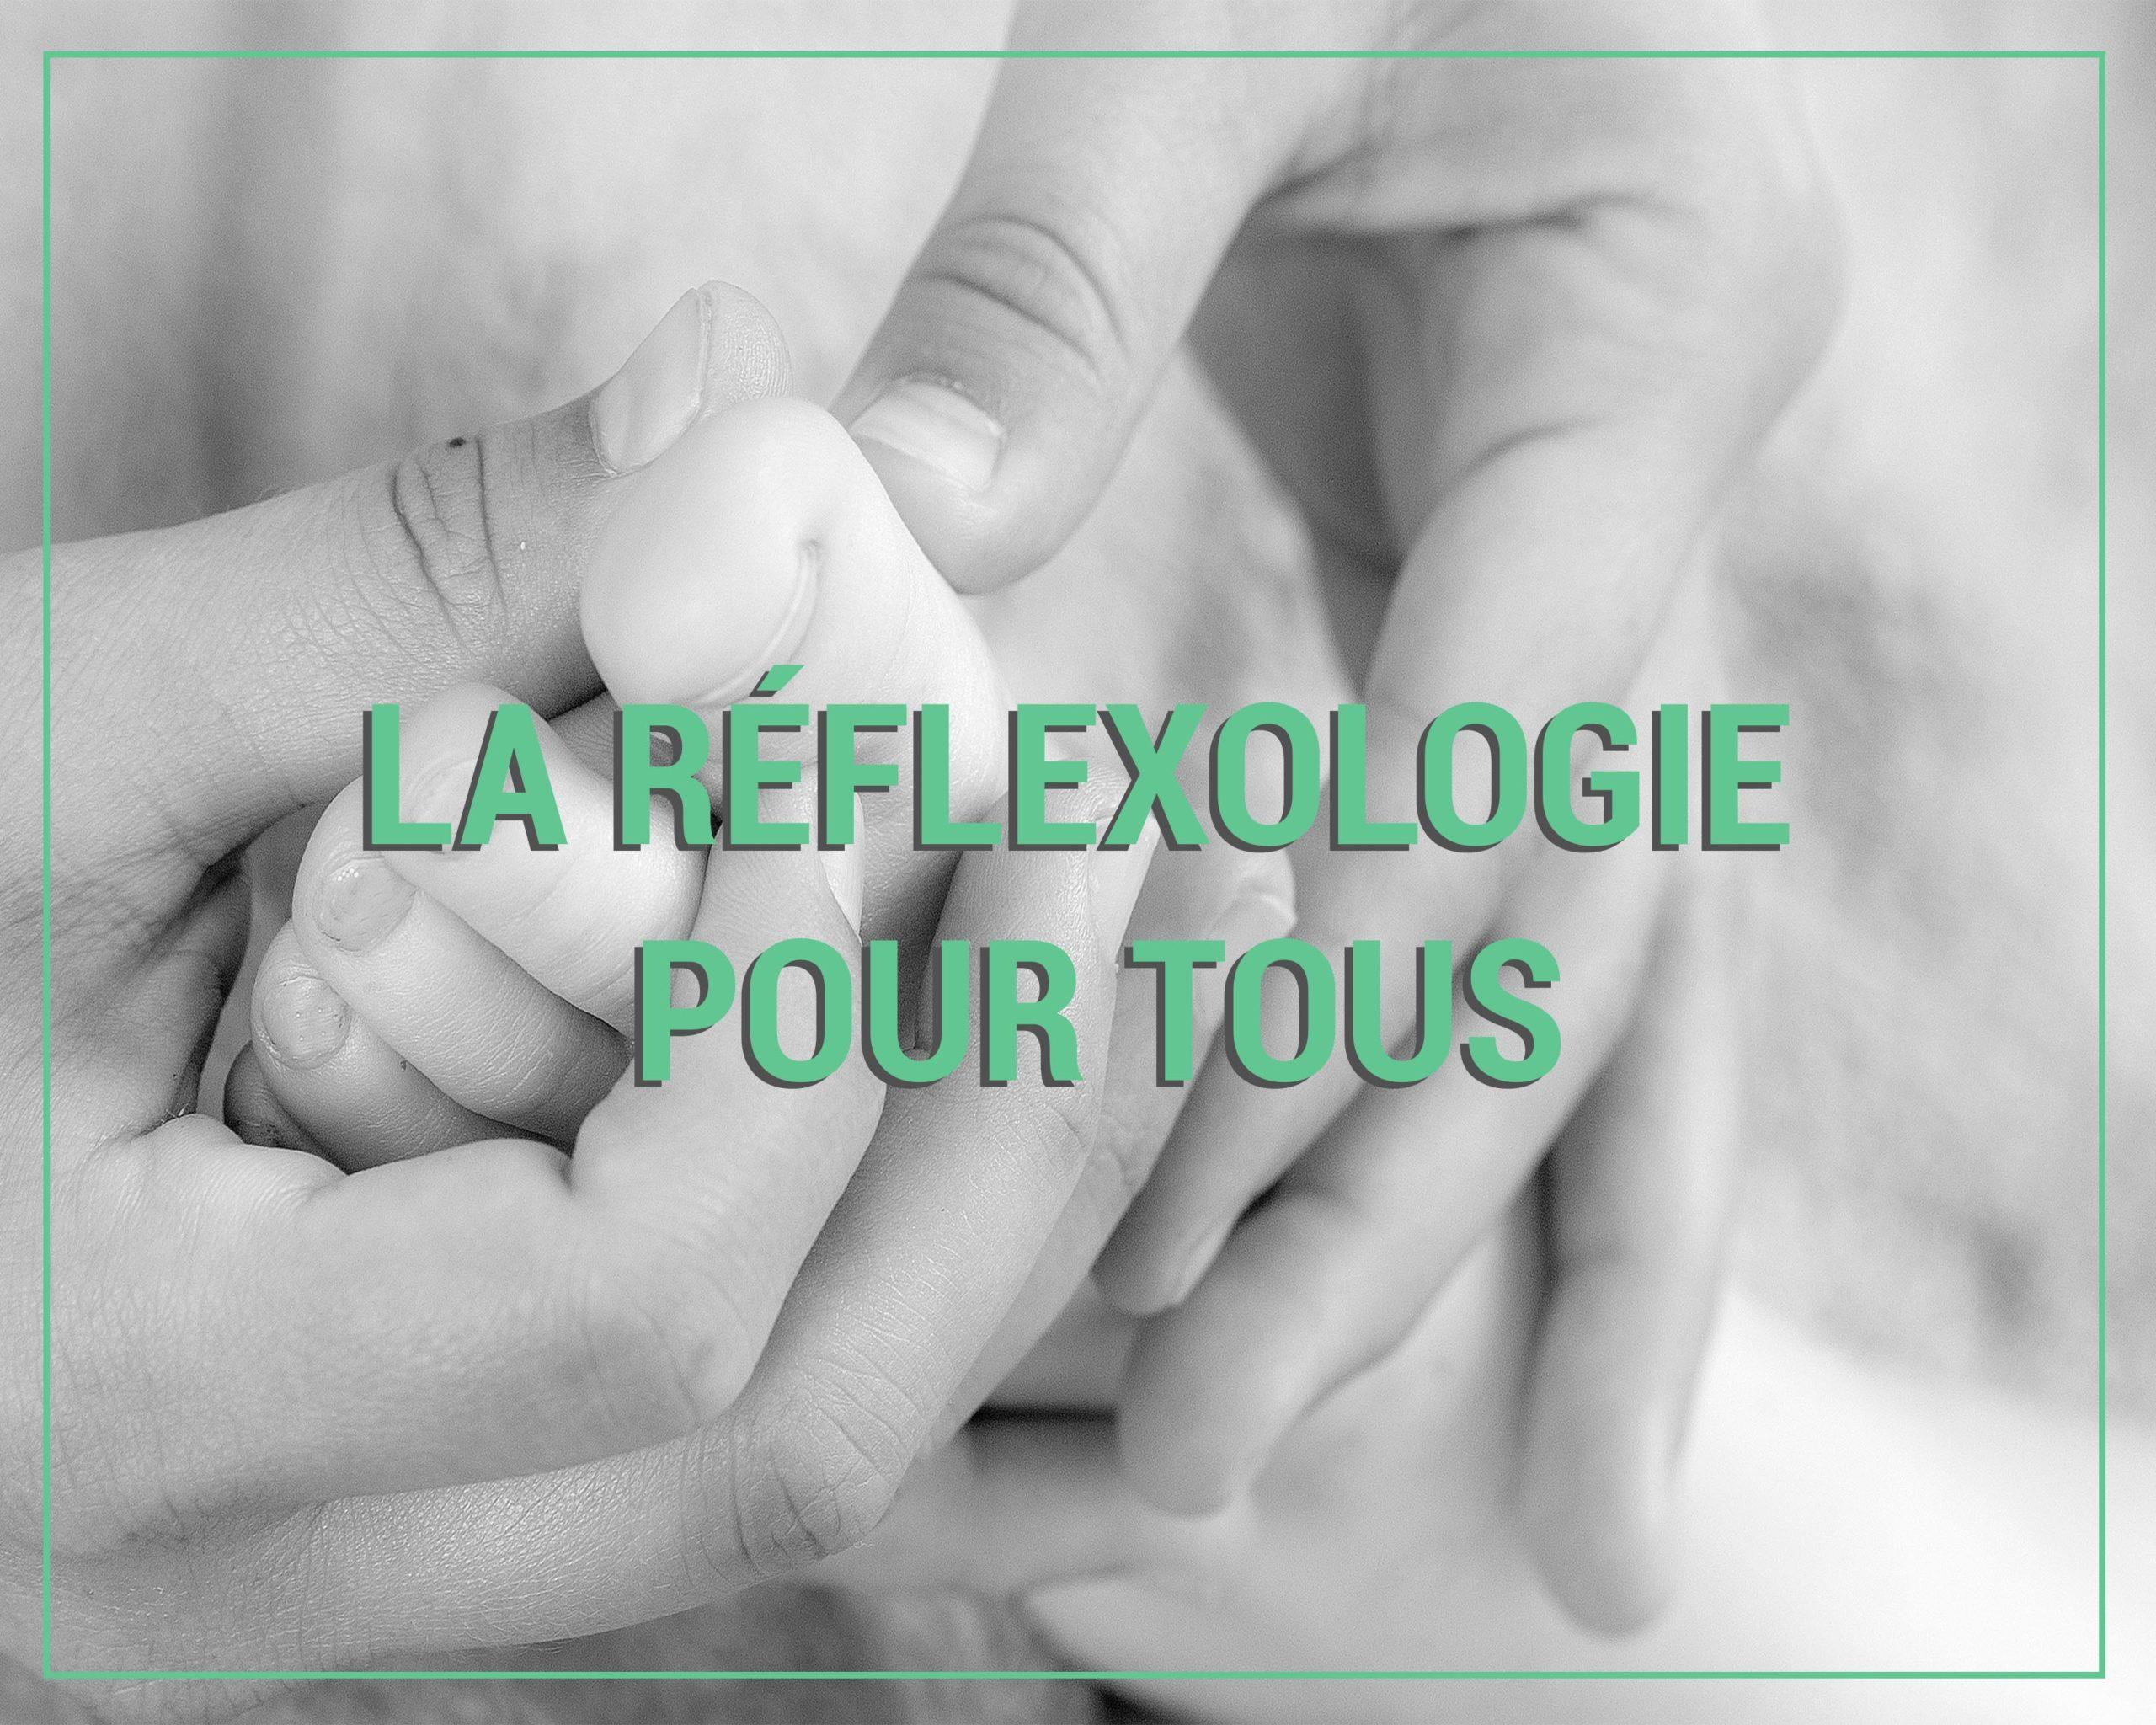 reflexologie-pour-tous